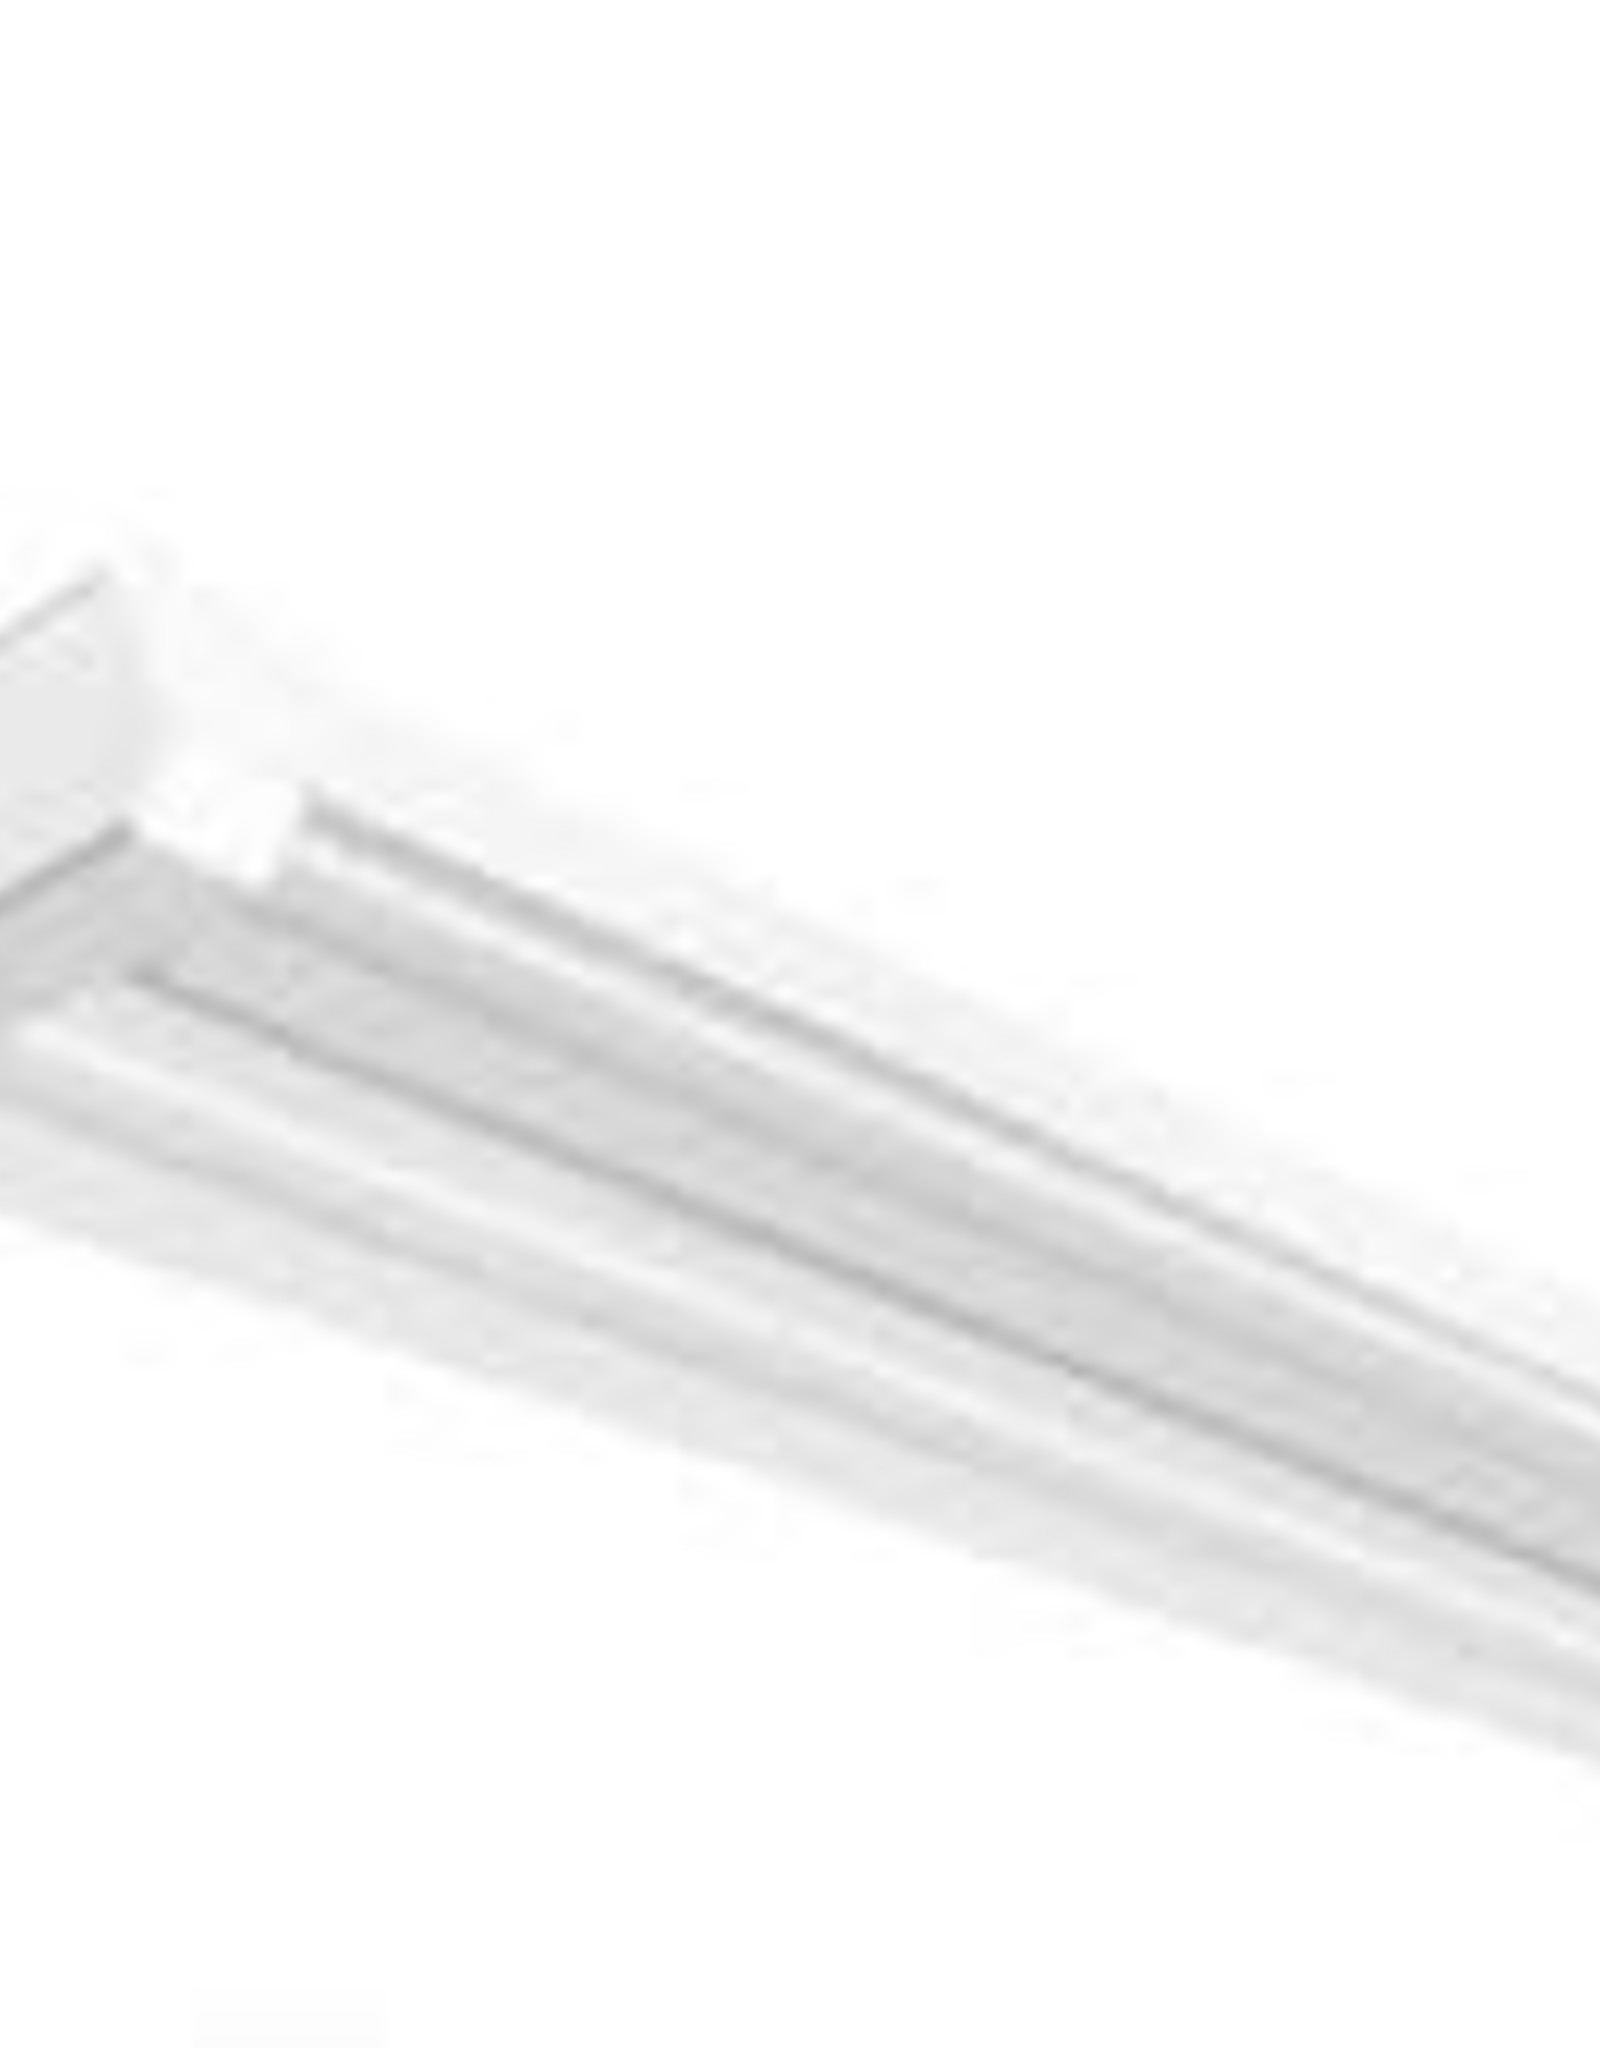 FEIT ELECTRIC COMPANY FEIT LED SHOP LIGHT 4000L